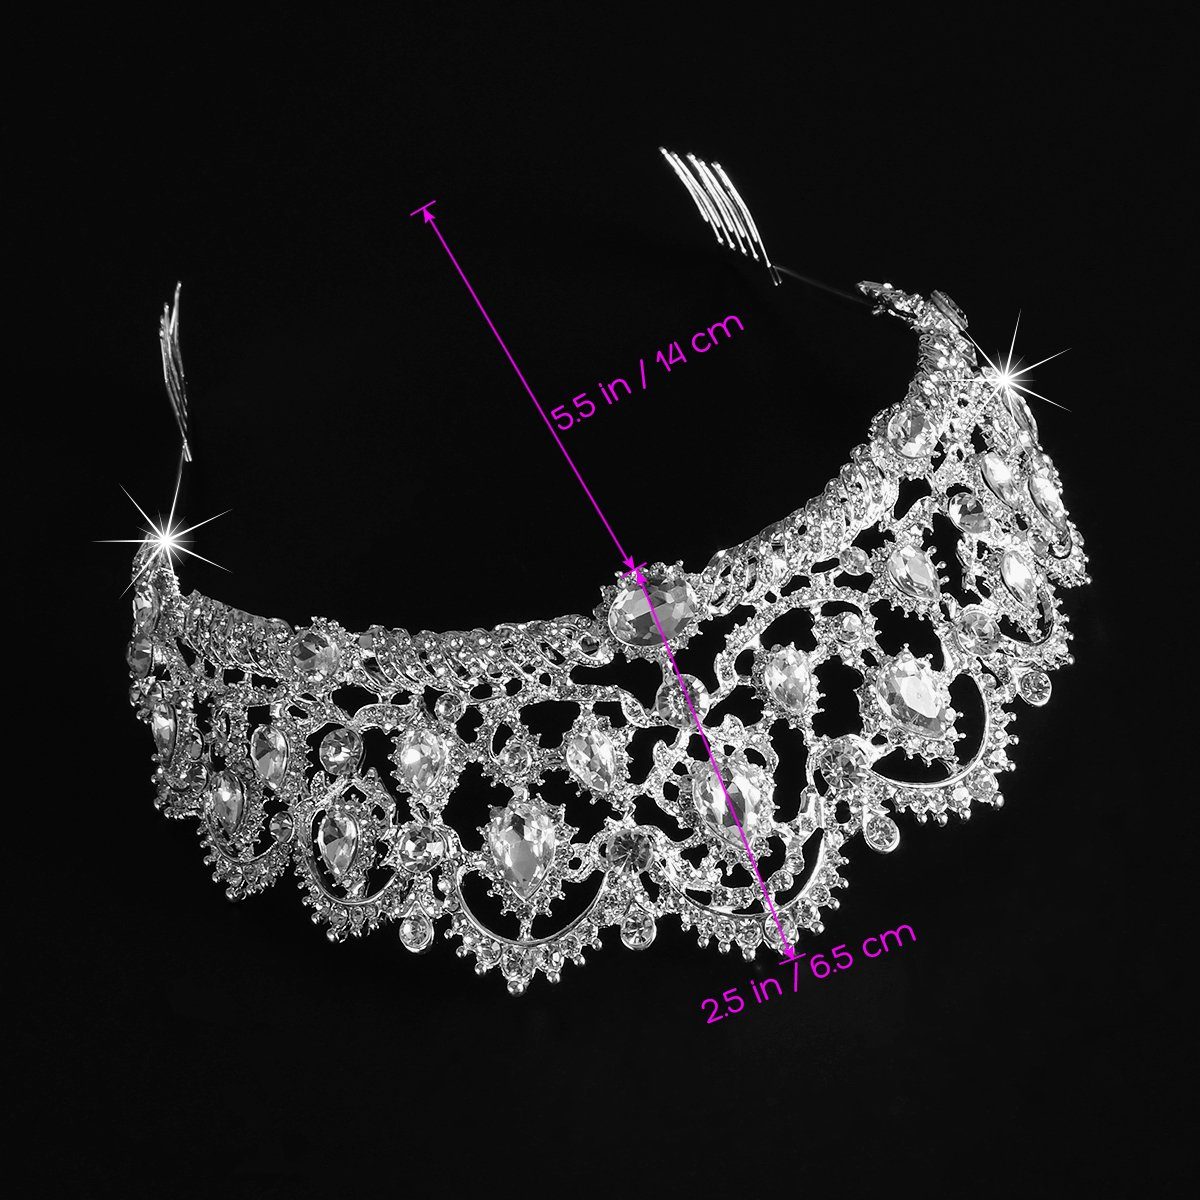 Tiara Crowns, Rhinestone Crystal Queen Tiara Headband Wedding Pageant Crowns Princess Crown for Women